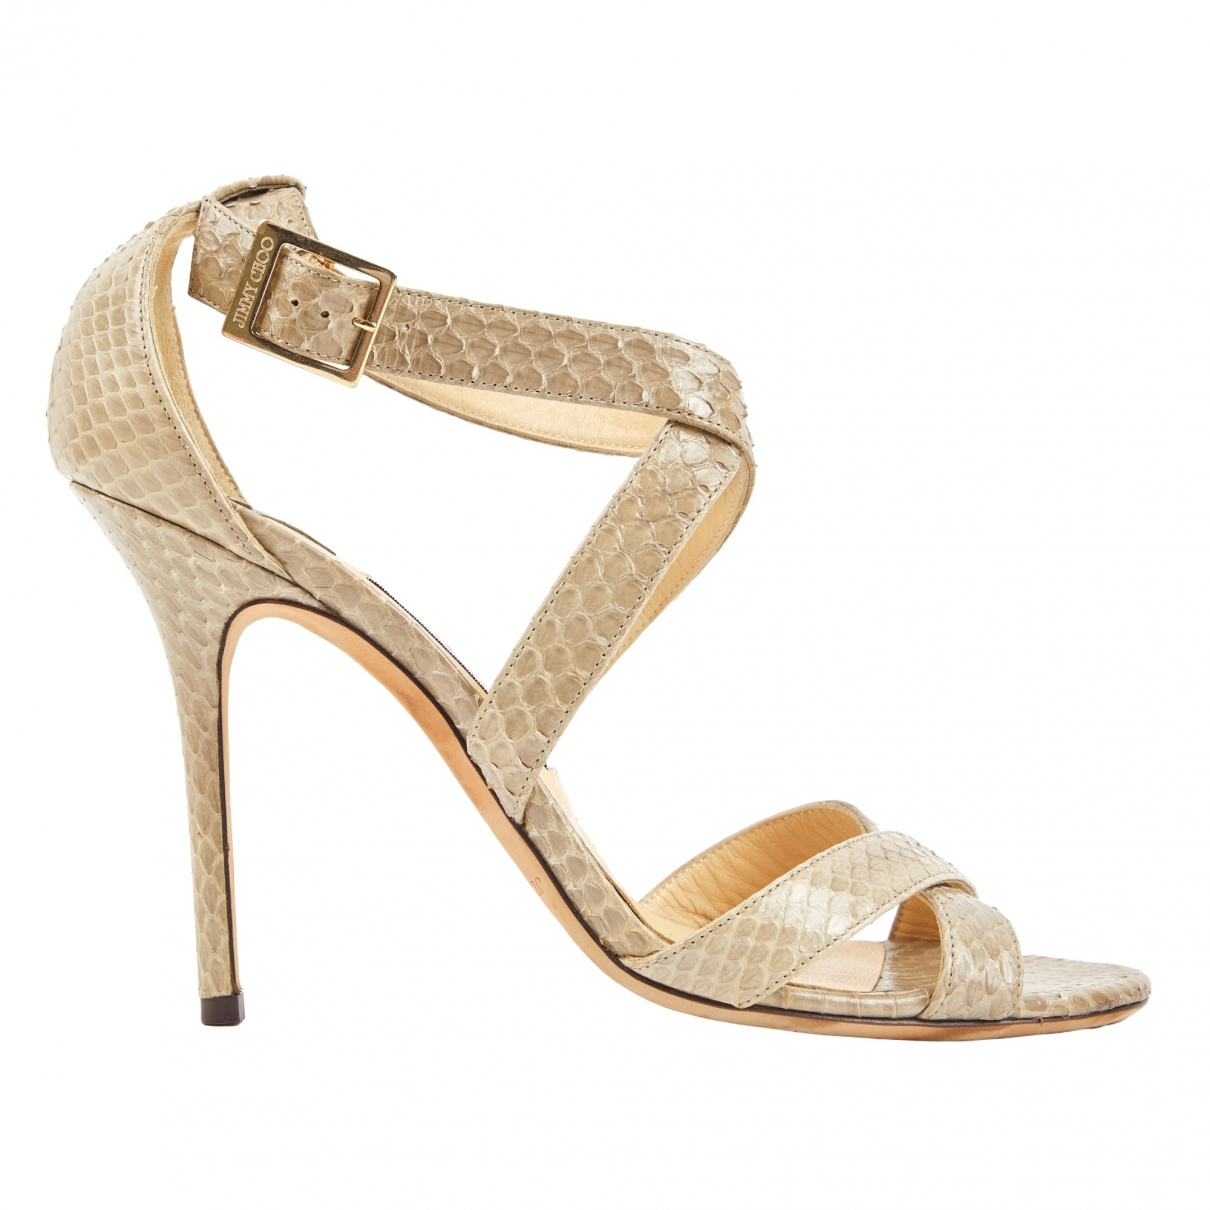 Jimmy Choo \N Beige Python Sandals for Women 41 EU